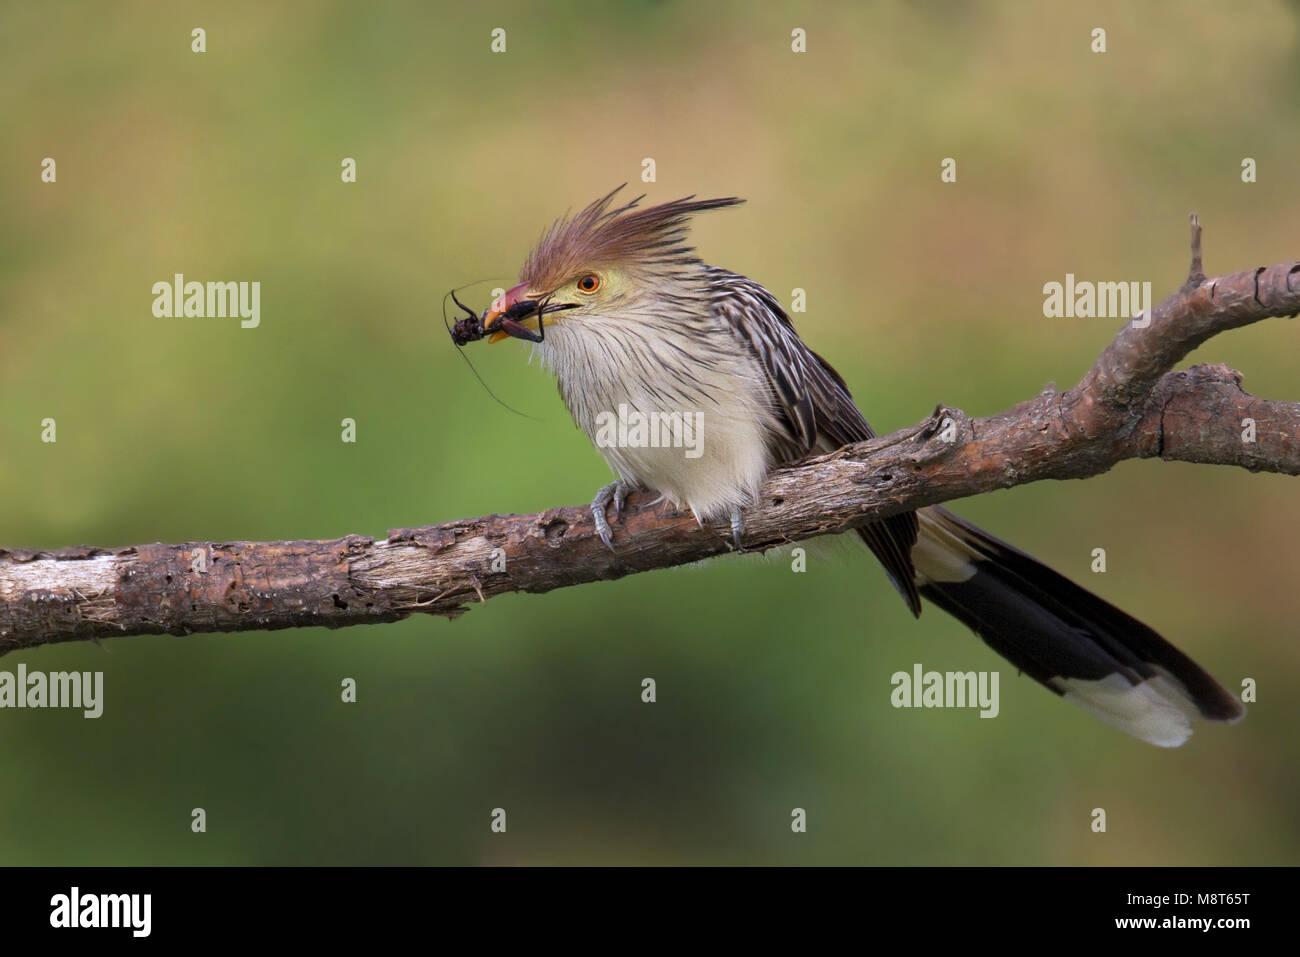 Zuidamerikaanse Kuifkoekoek met prooi, Guira Cuckoo with prey - Stock Image